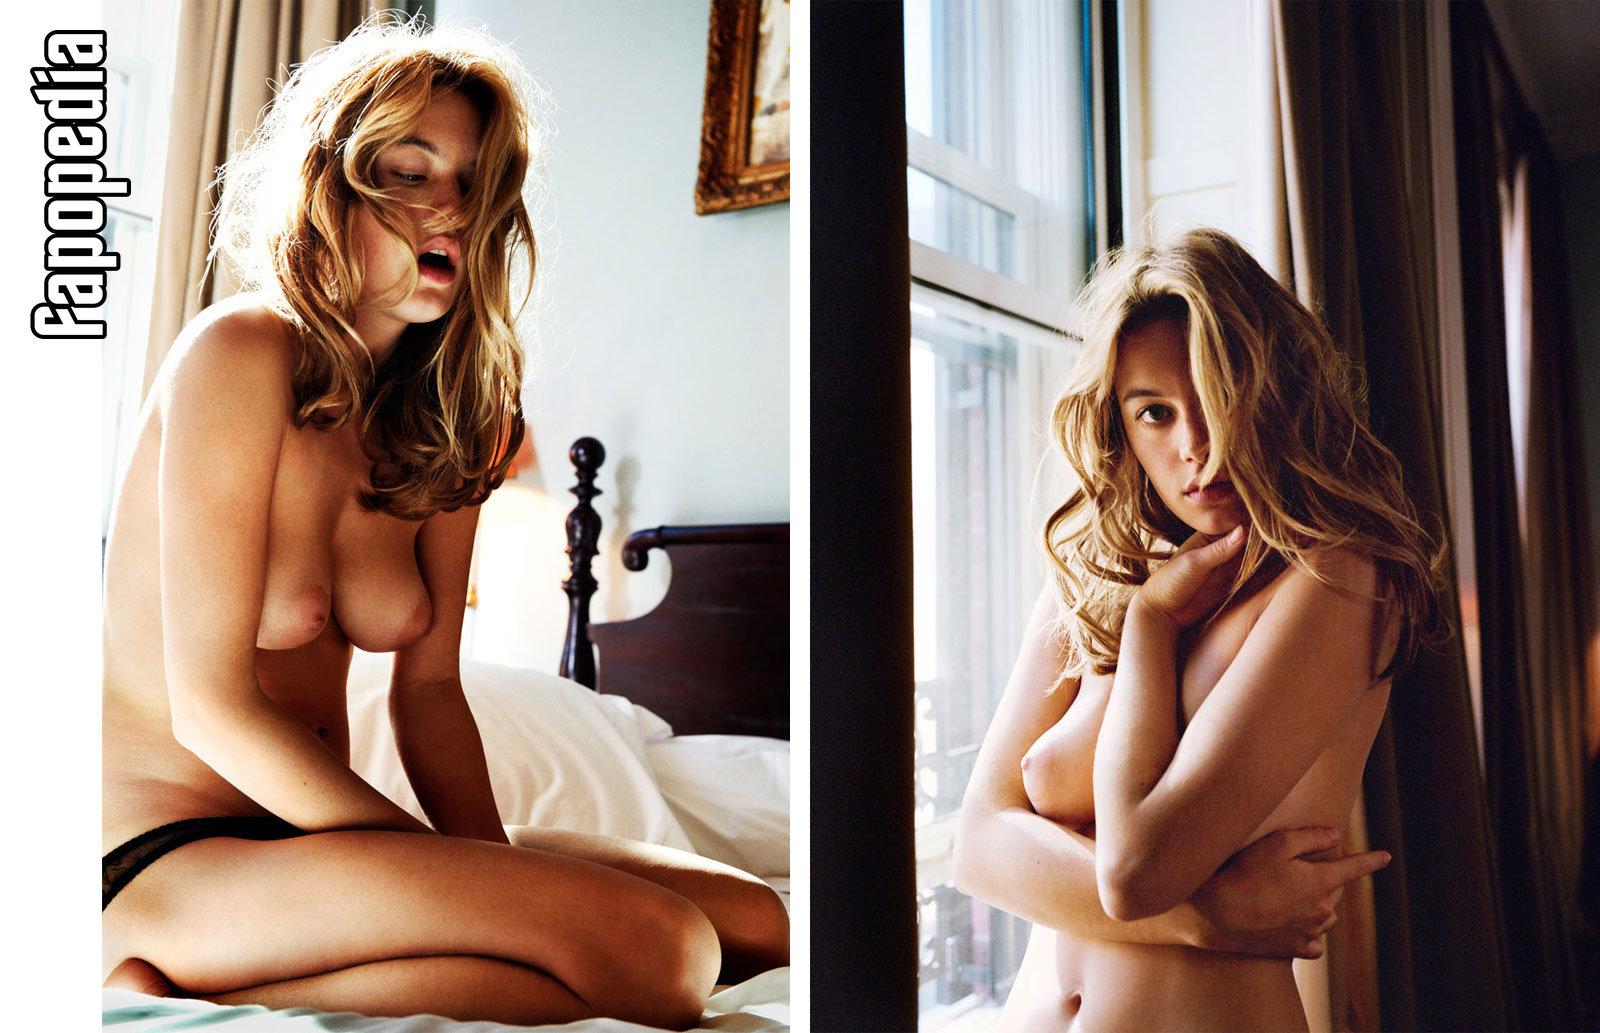 Yasmine Vox Nude Pics, Page